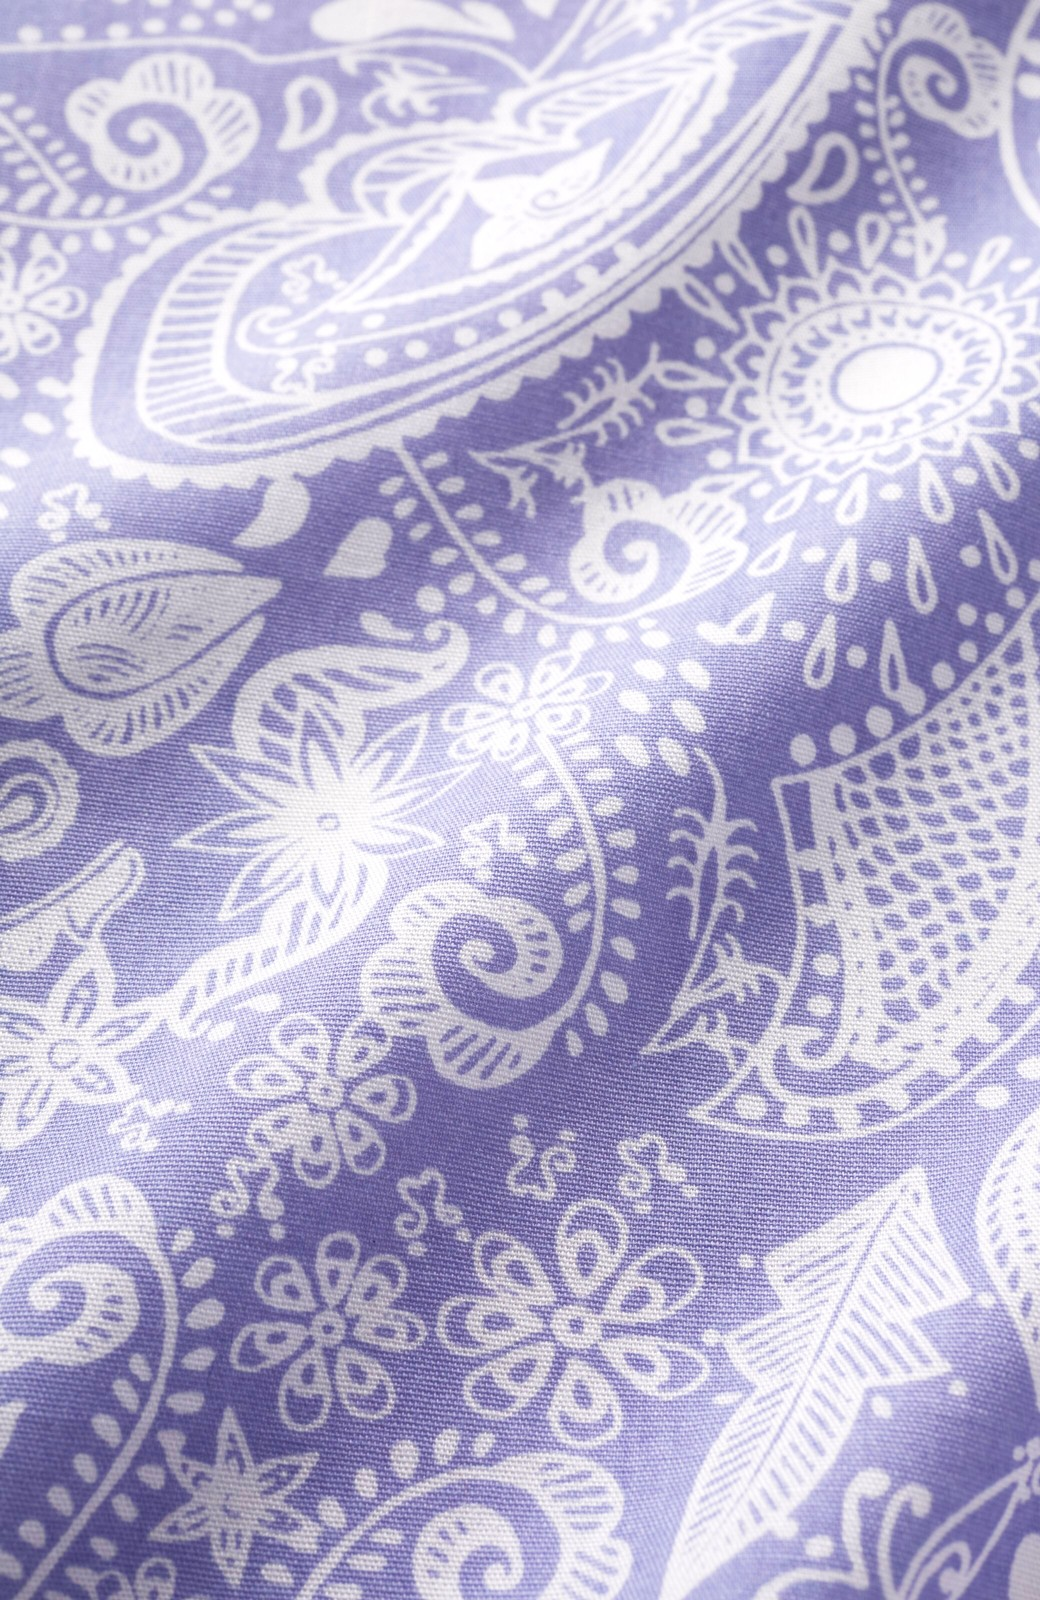 haco! PBP オーガニックコットン インドのお守り フリルがかわいいメヘンディ柄のブラウス <パープル系その他>の商品写真3